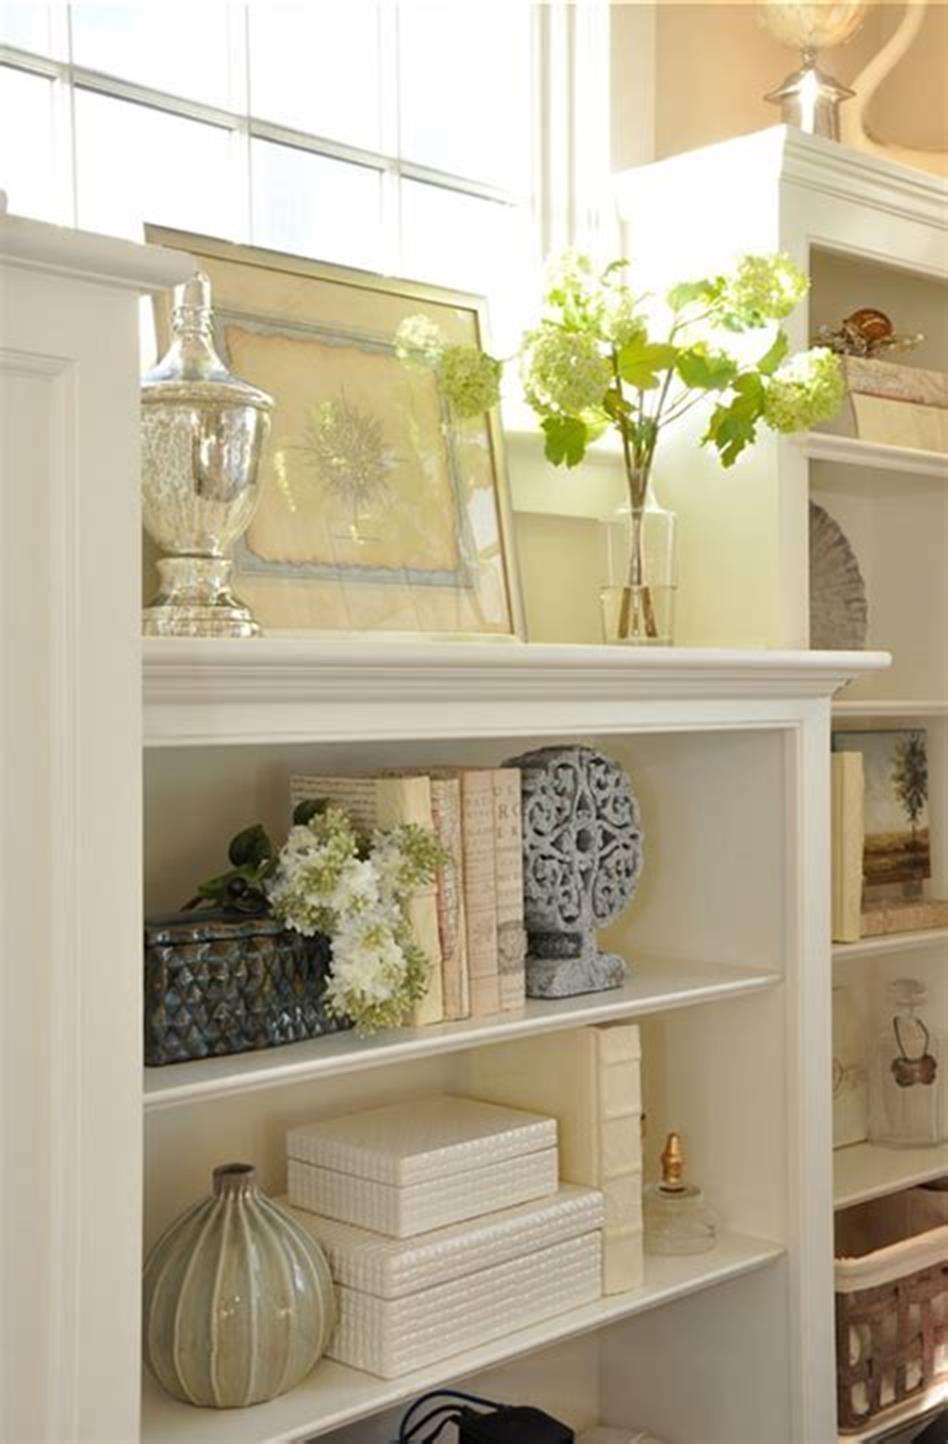 35 Unique and Creative Bookshelves Design Ideas | Home ...